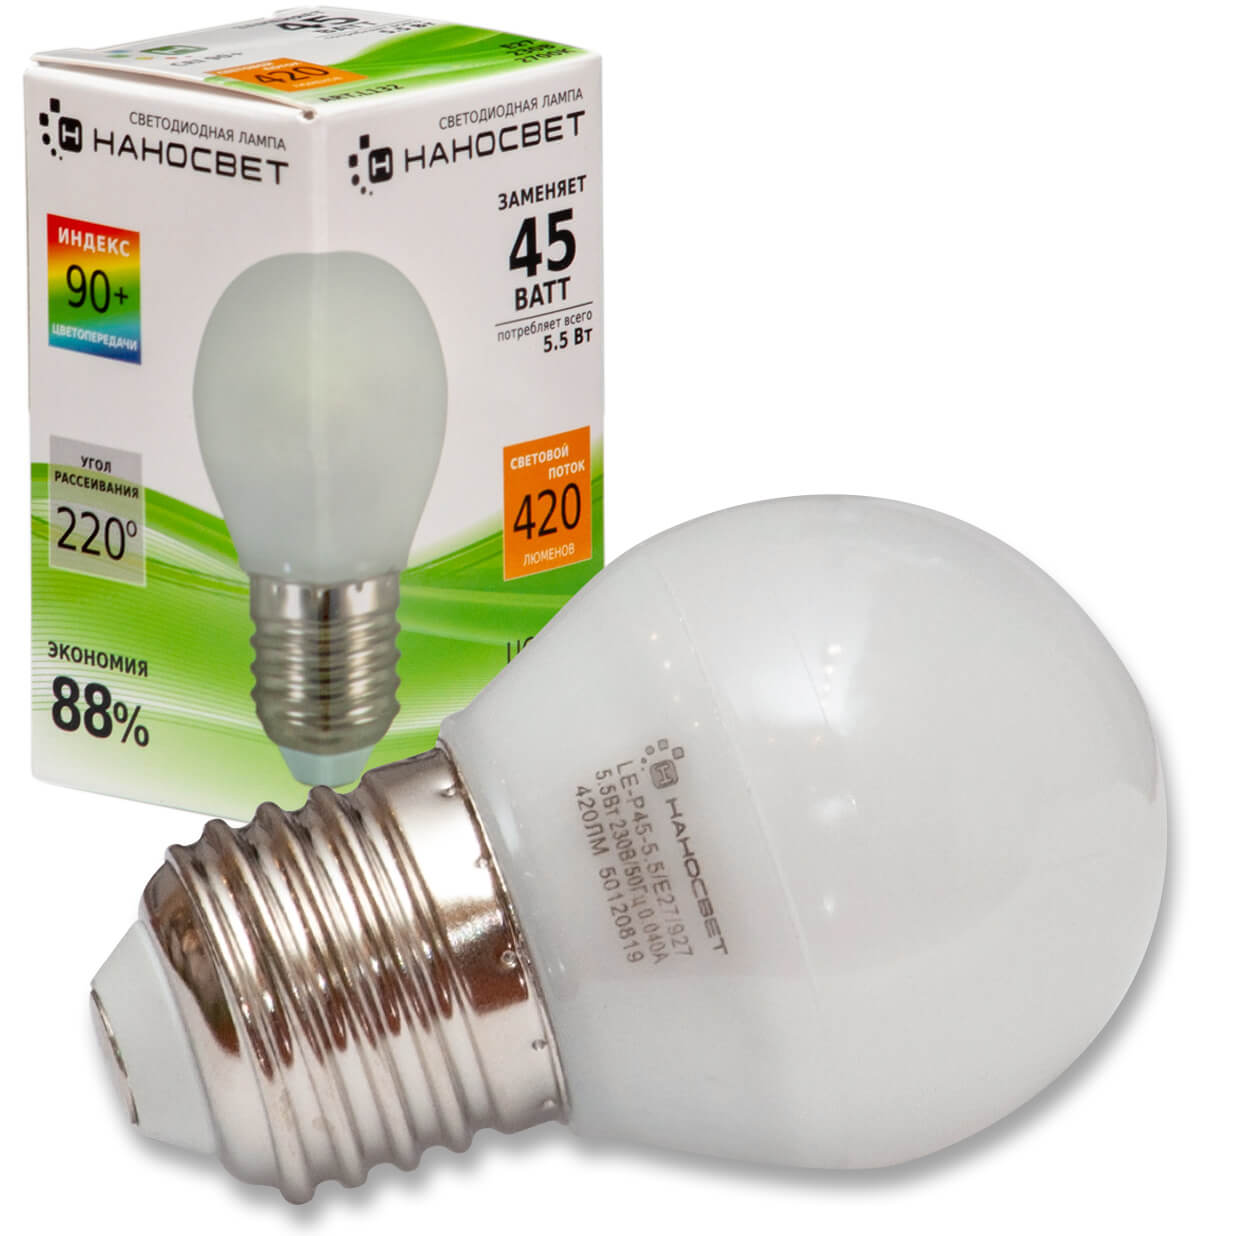 Лампа светодиодная Наносвет E27 6,5W 2700K матовая LE-P45-6.5/E27/827 L132